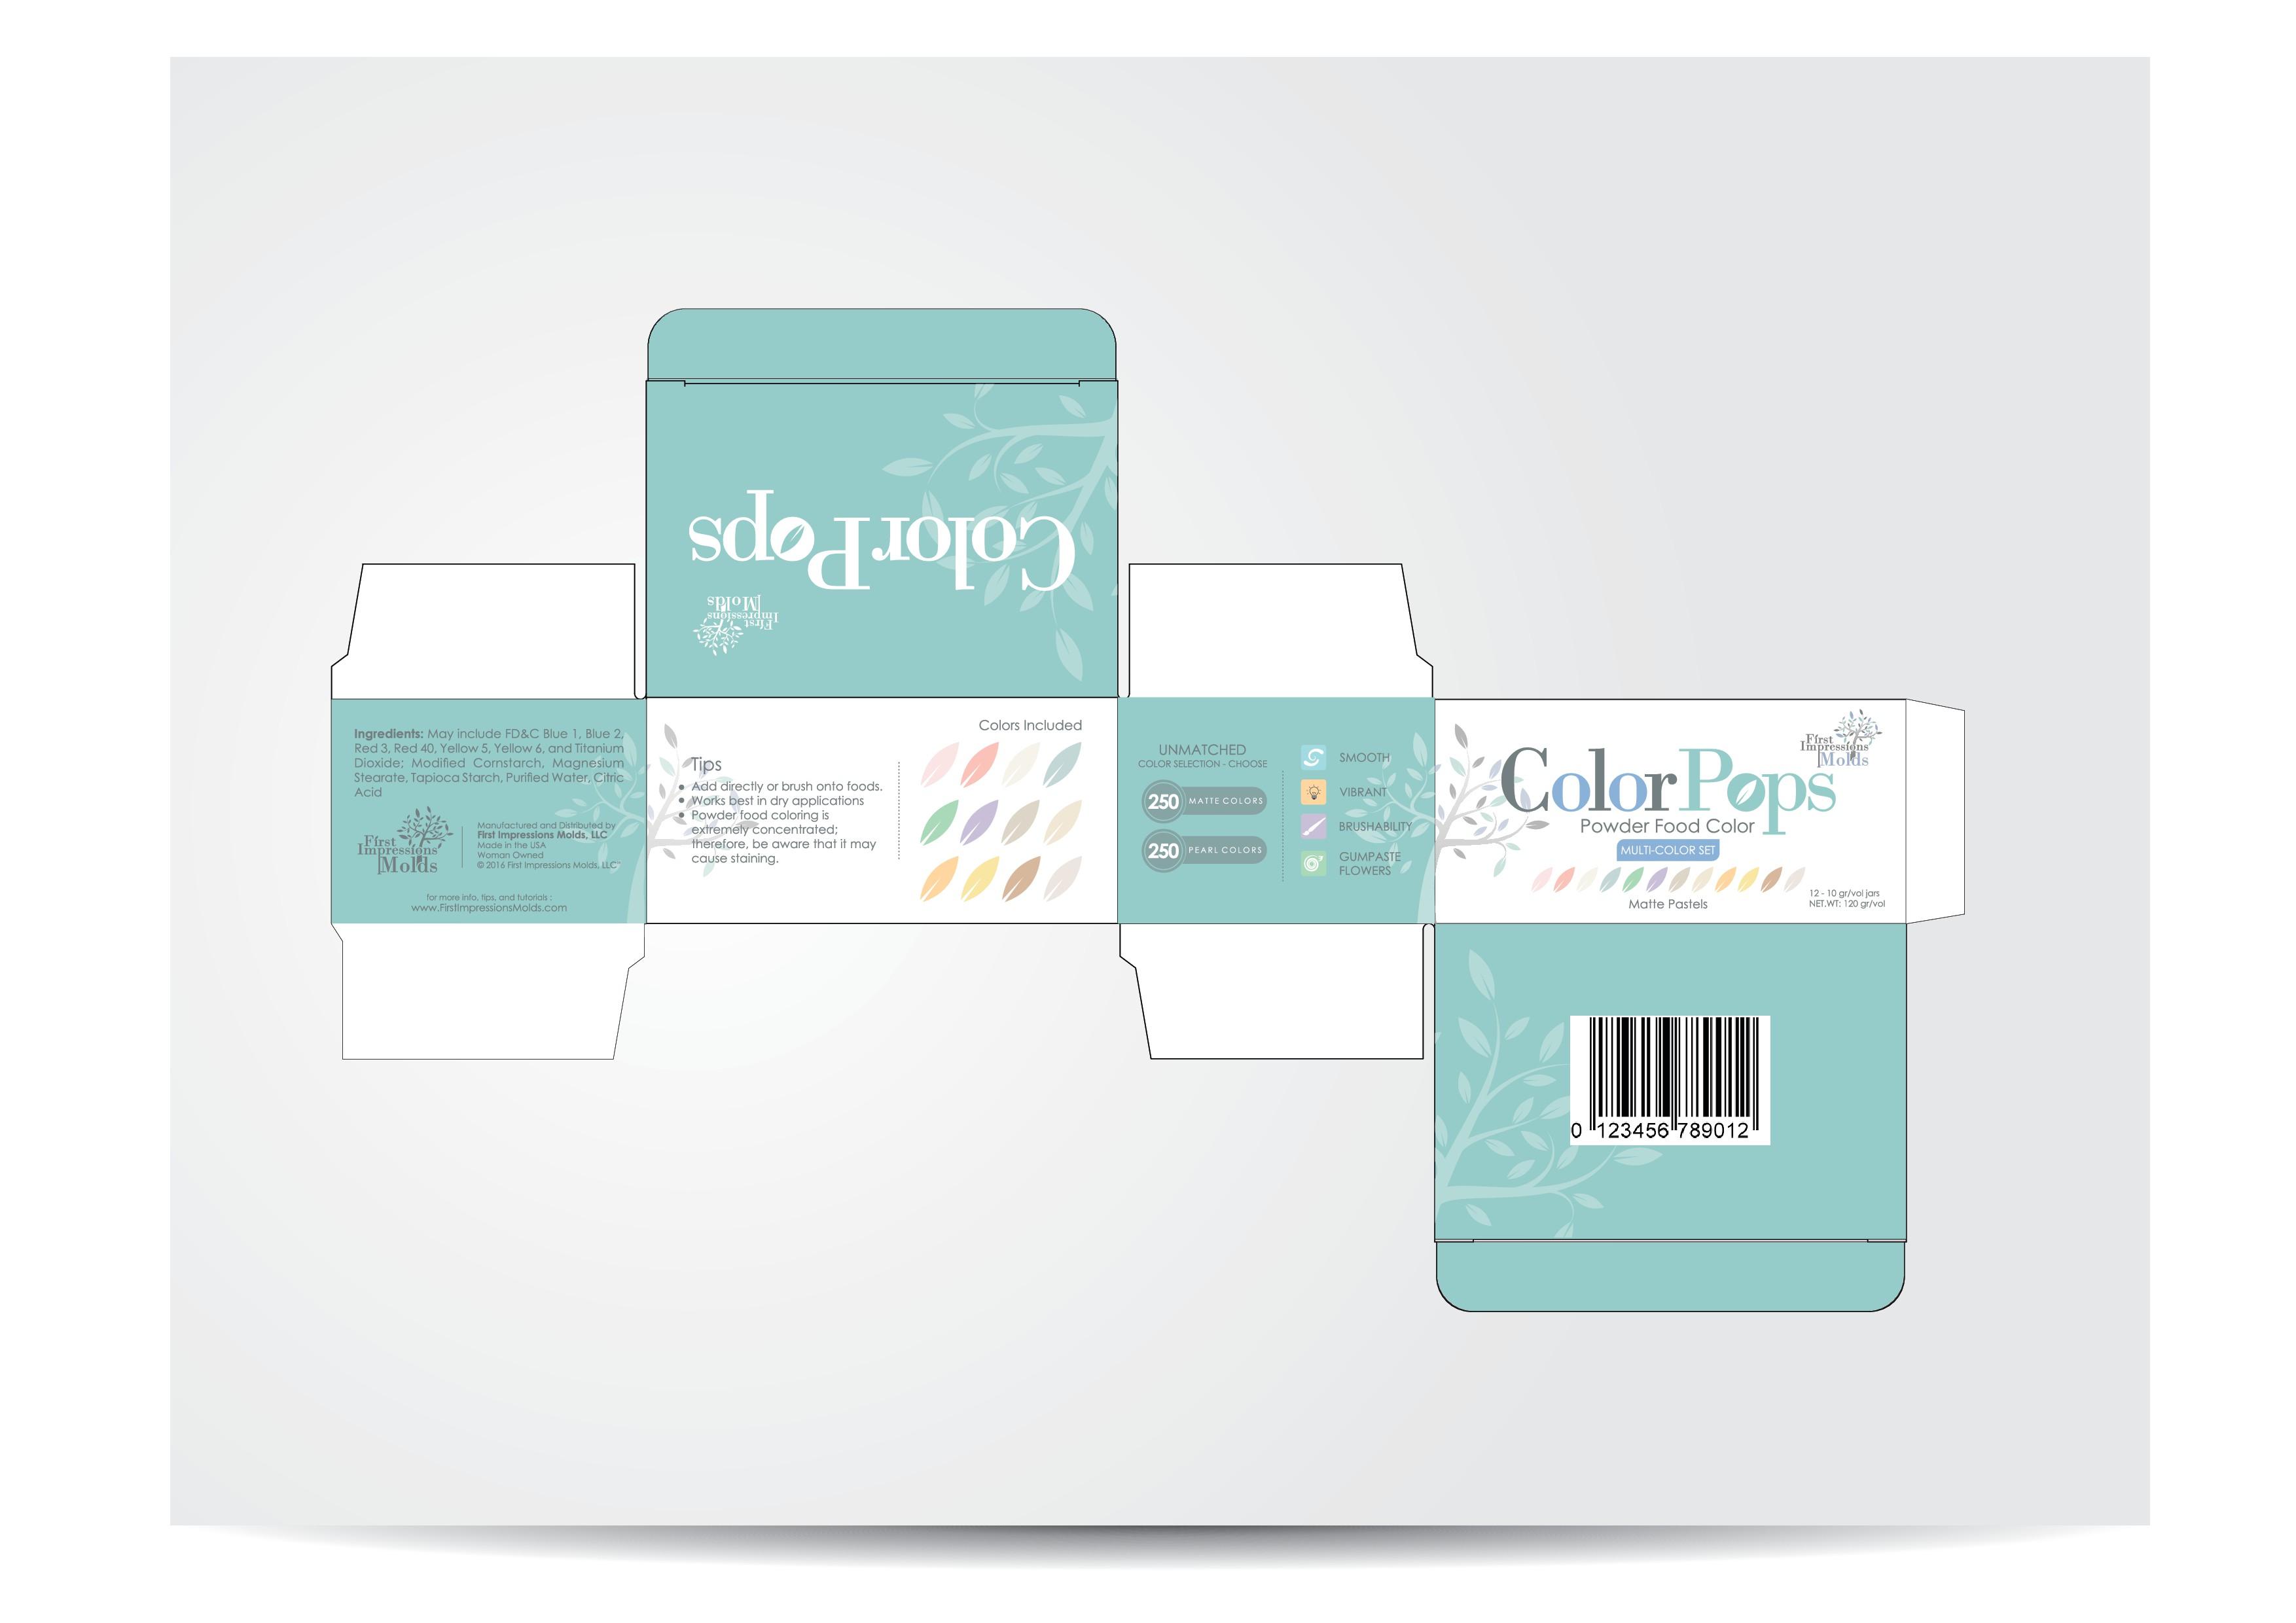 Design creative retail boxes for Color Pops!